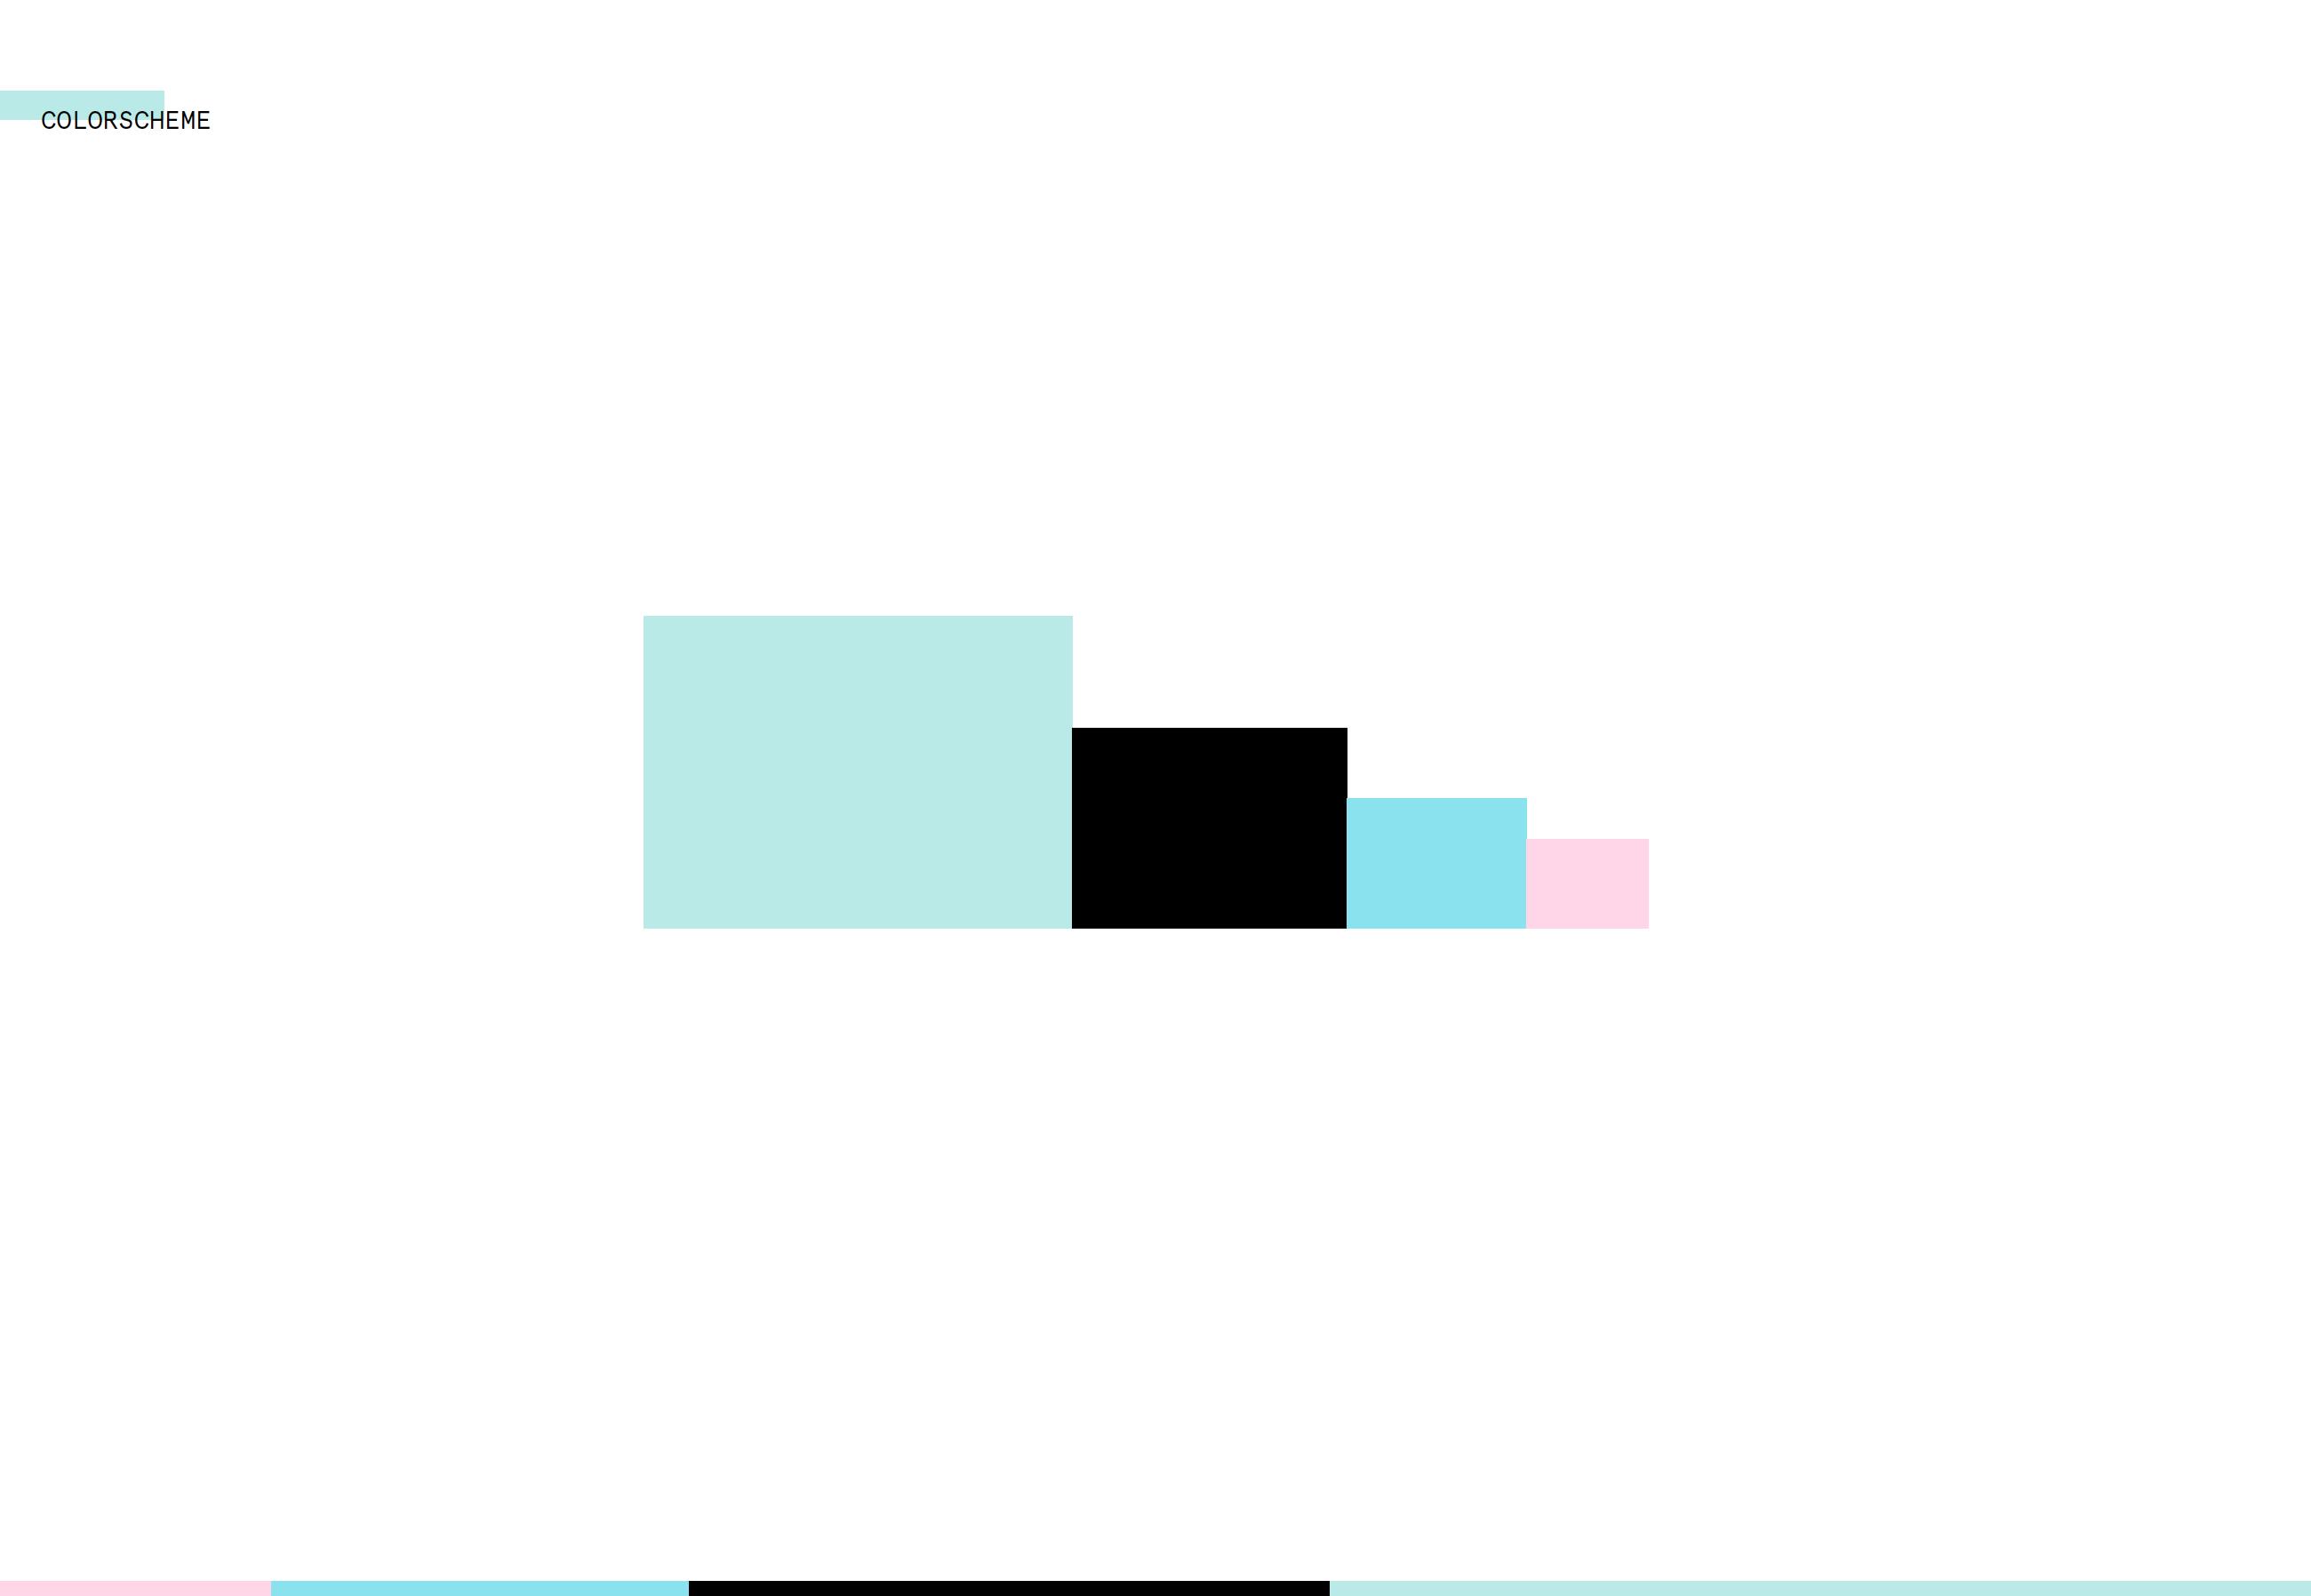 pulsar_philipjohansen_colors